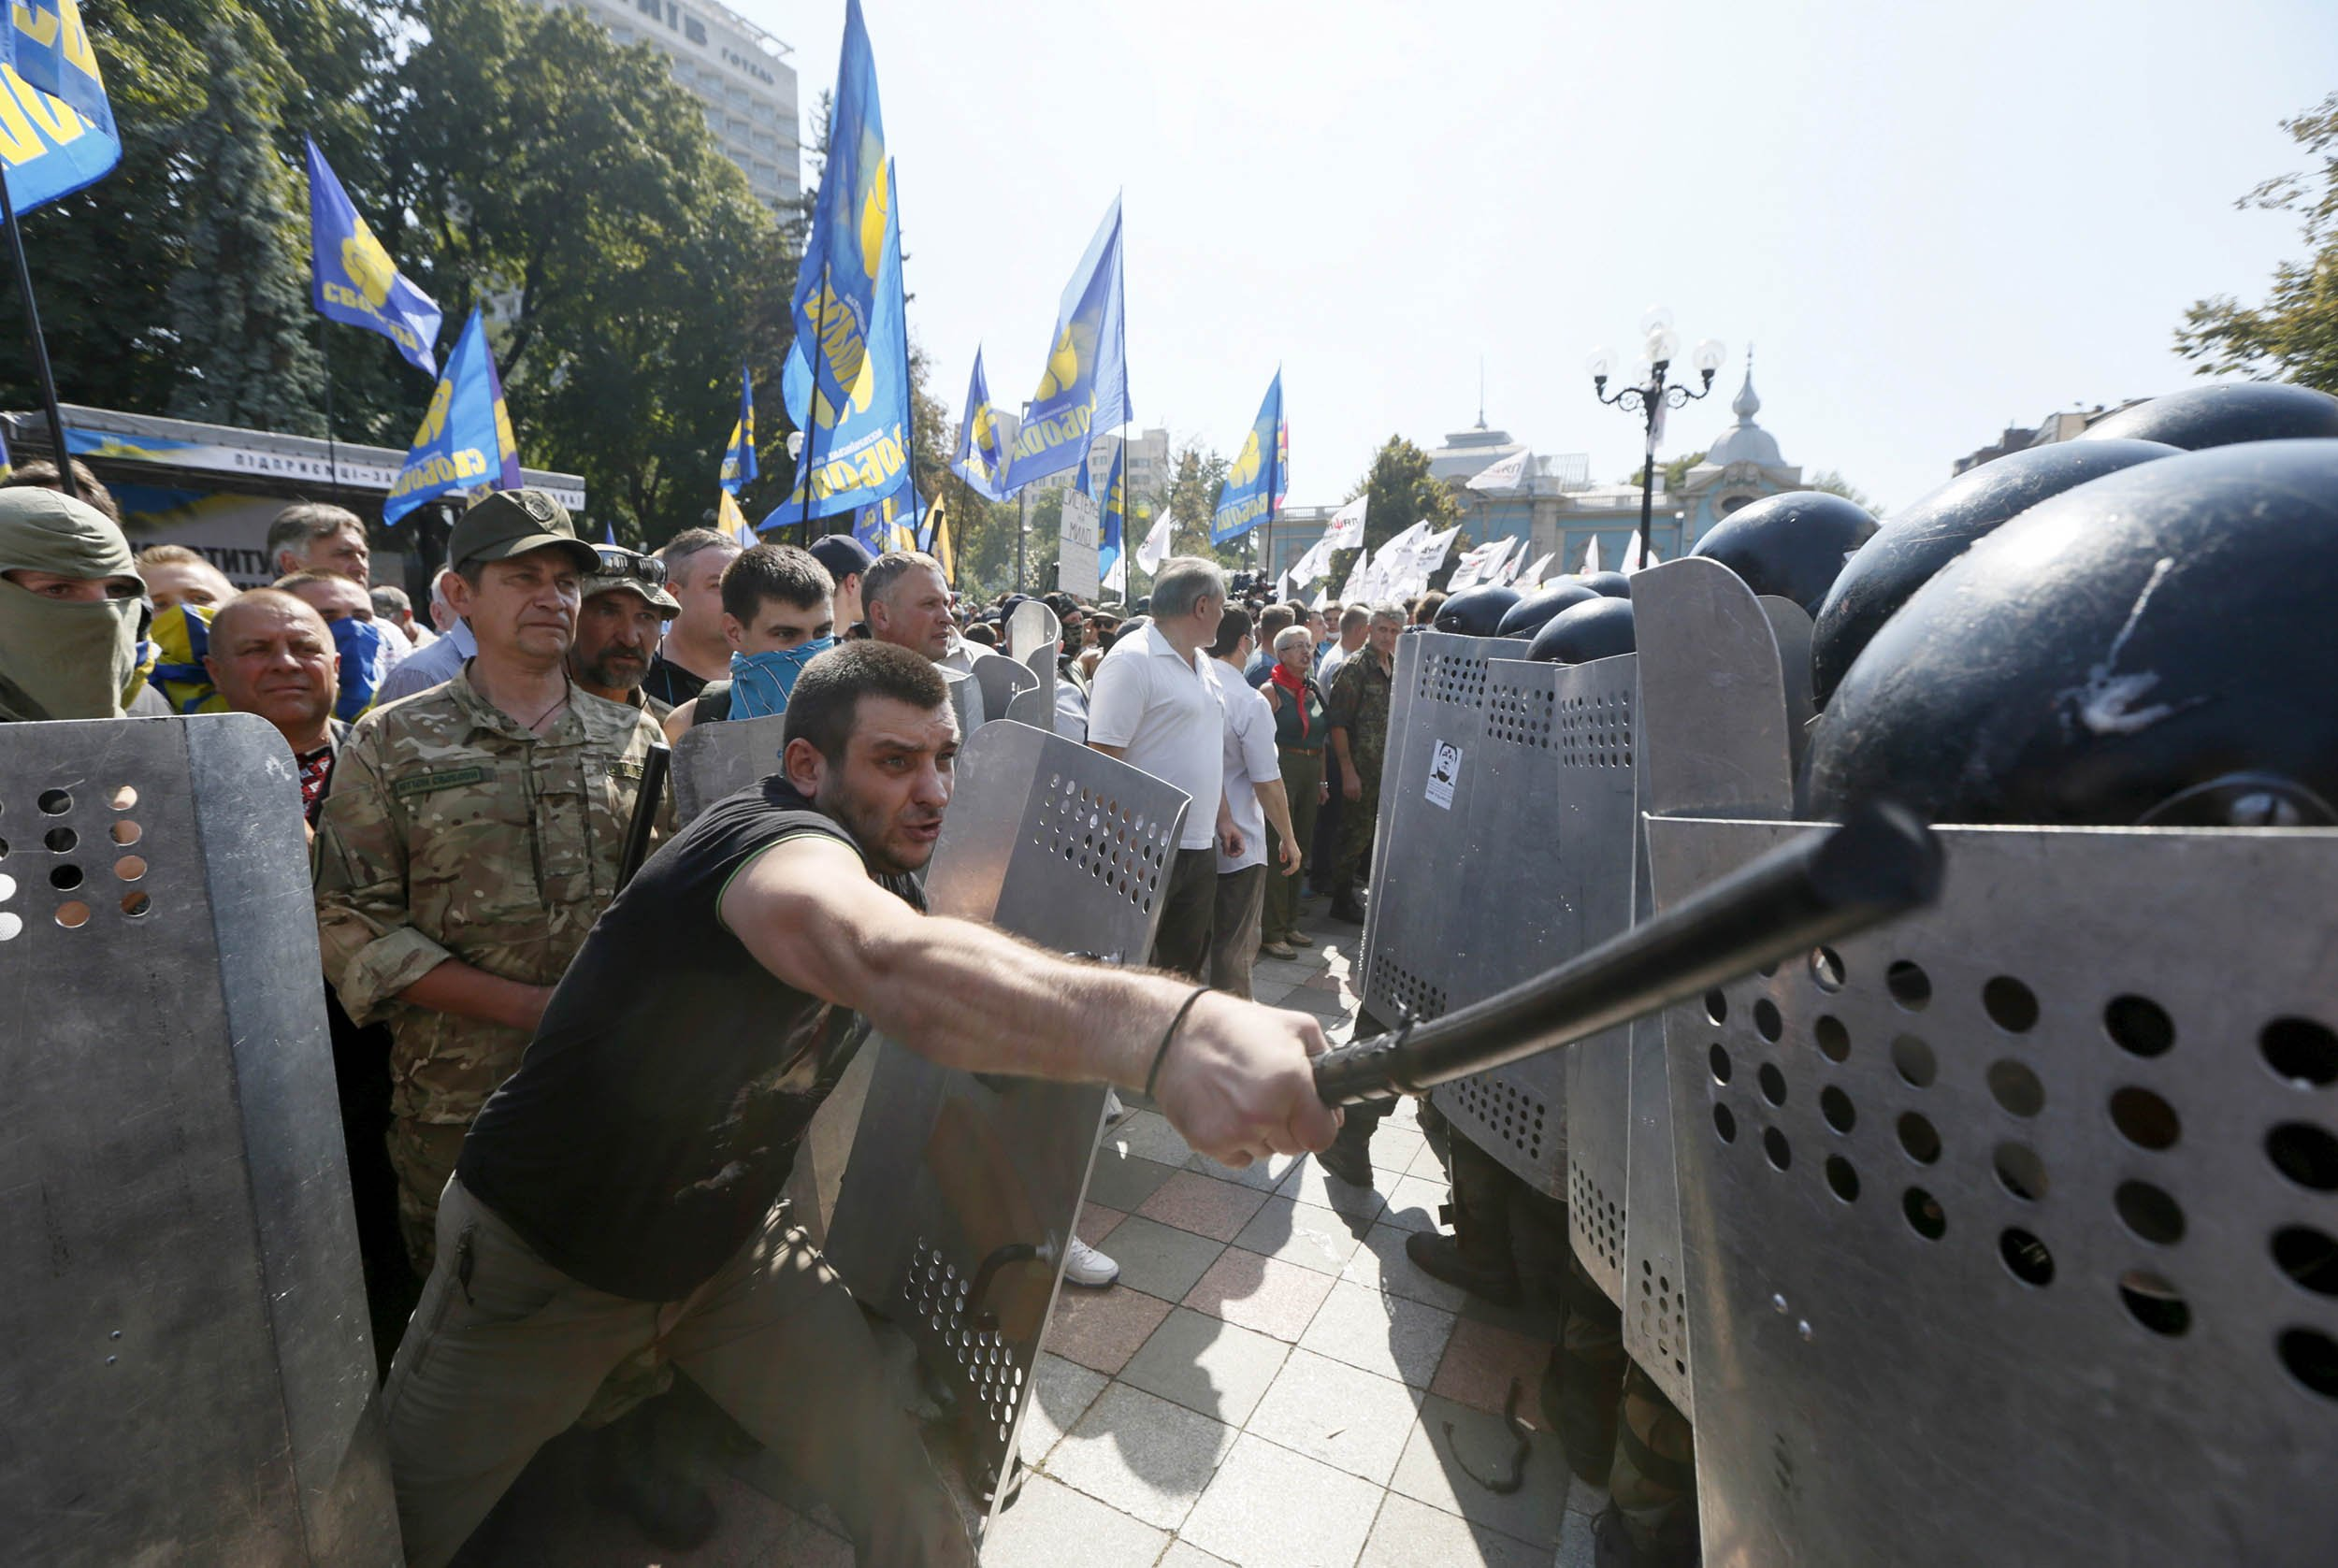 08_31_Ukraine_01